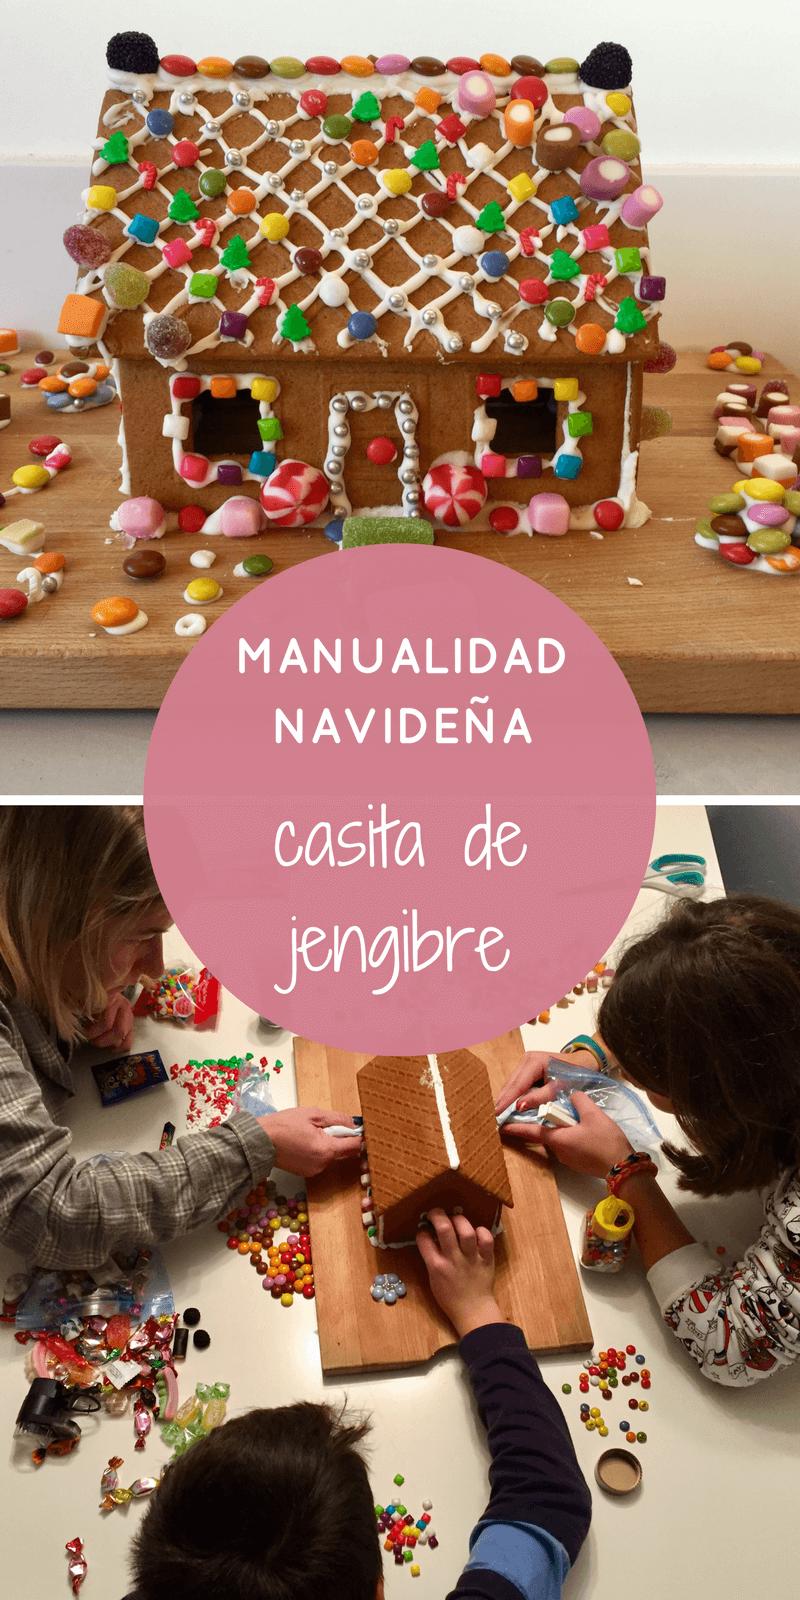 manualidad navideña: casita de jengibre | Jengibre te, Manualidades ...